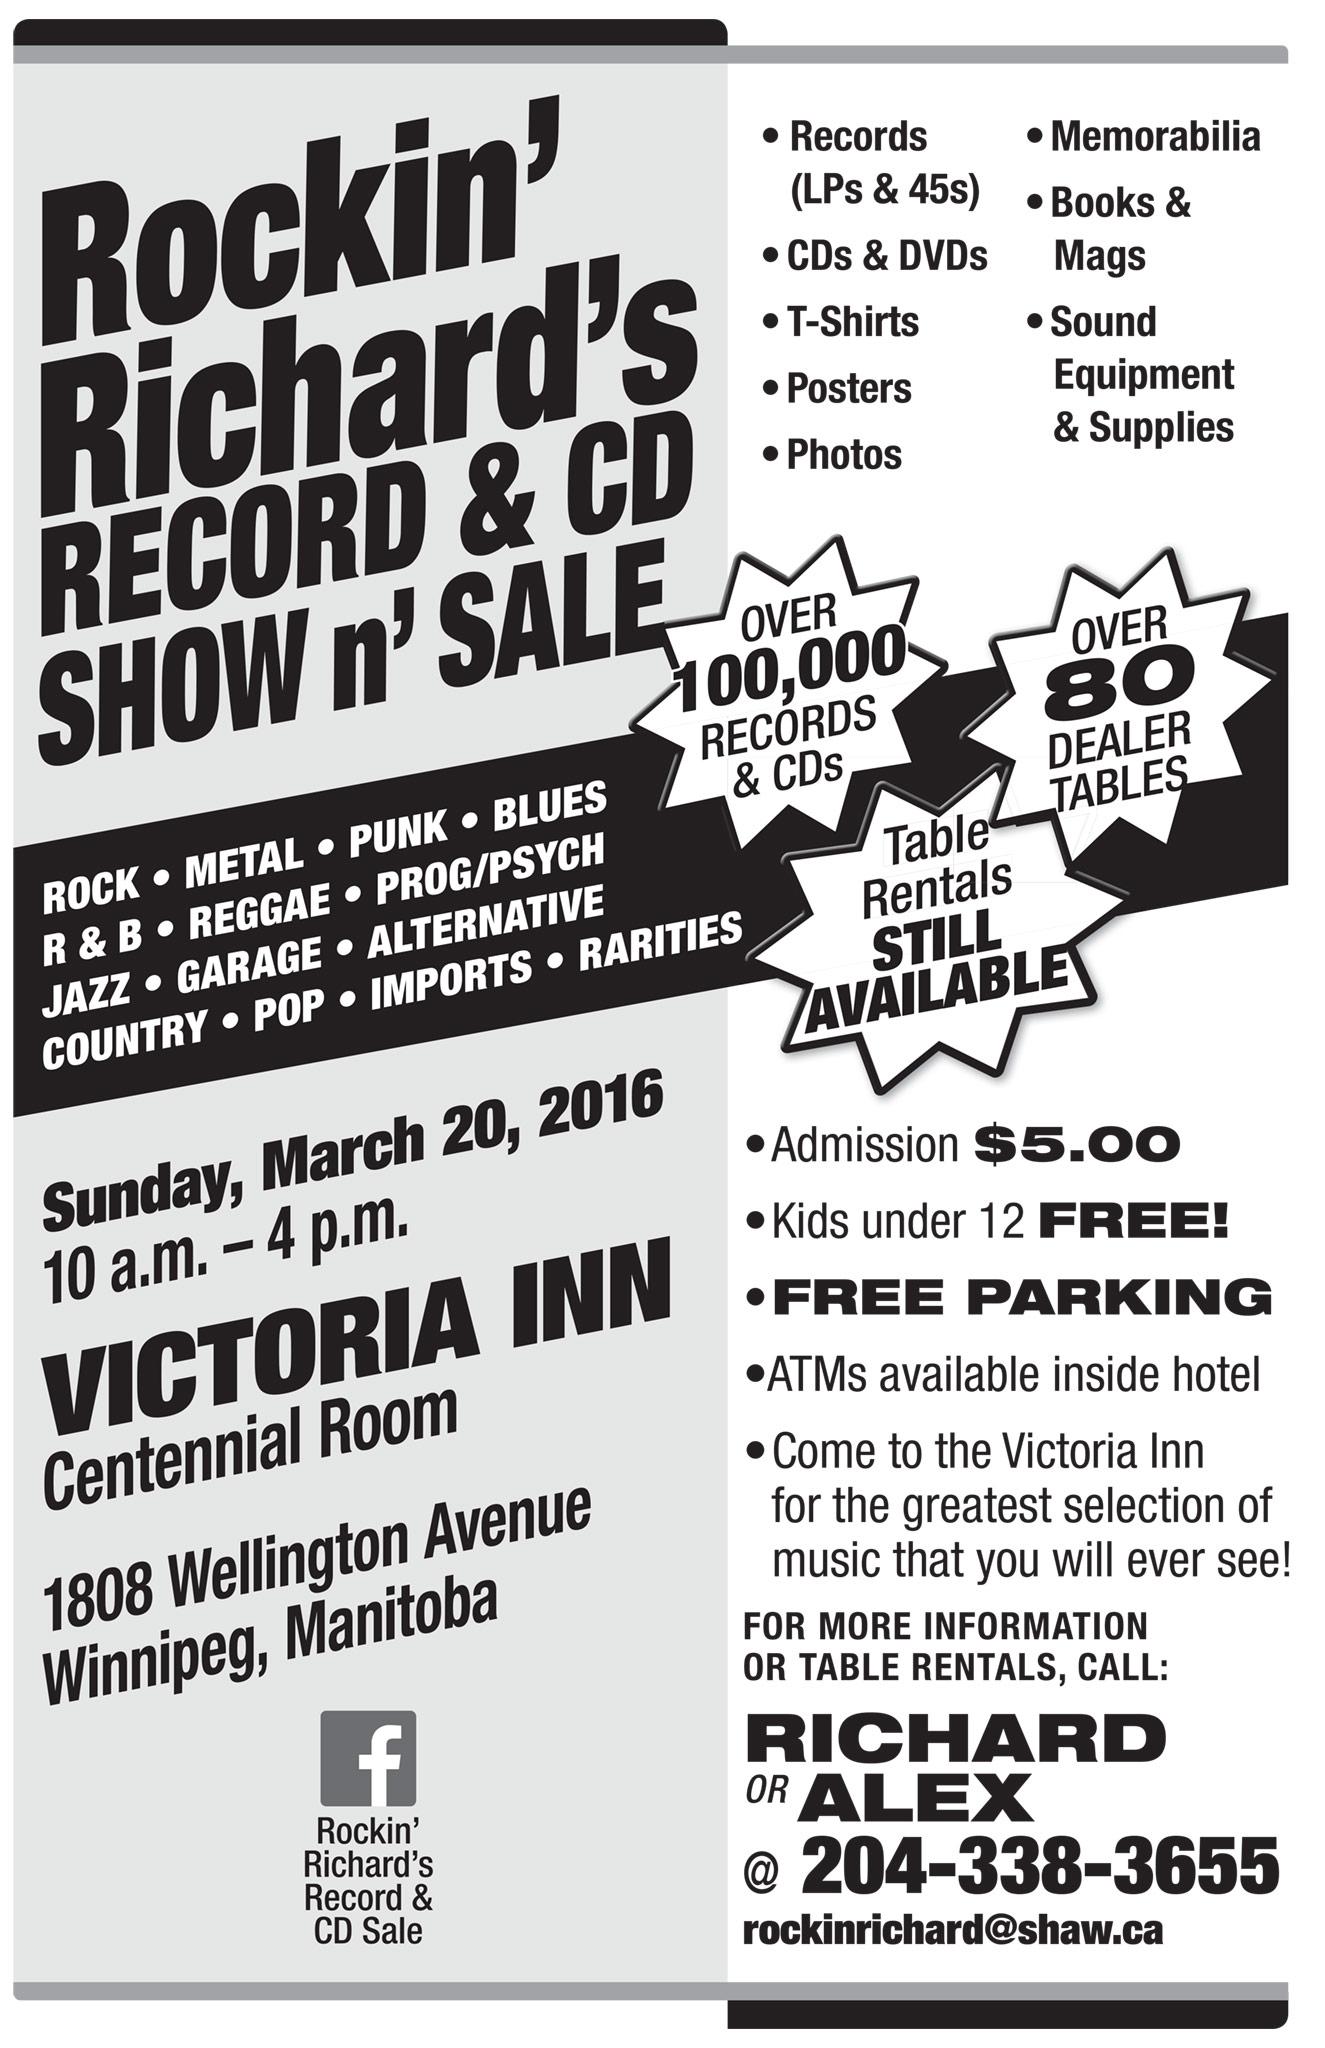 Rockin' Richard's Record & CD Sale Winnipeg March 20 2016